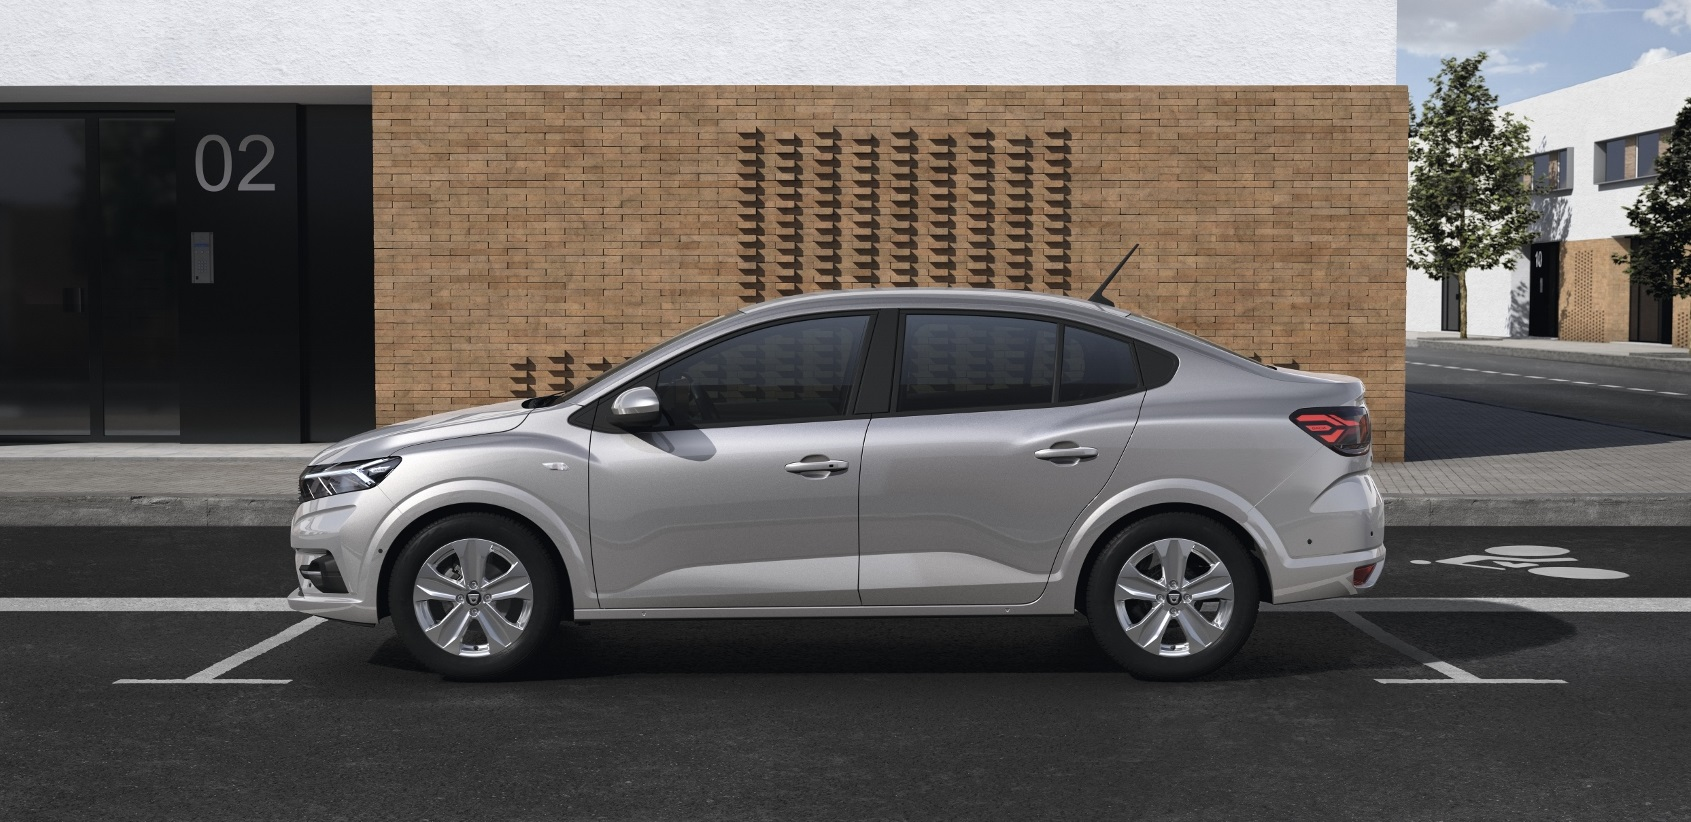 2020 - New Dacia LOGAN (1) (1700x1011)